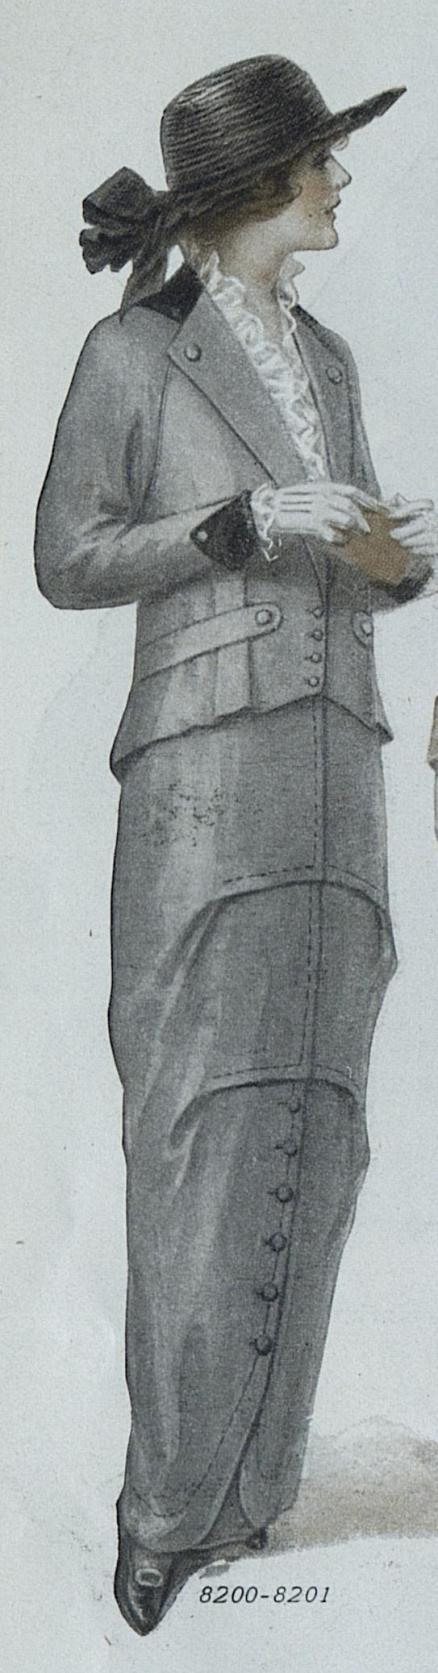 1914-03-94 a